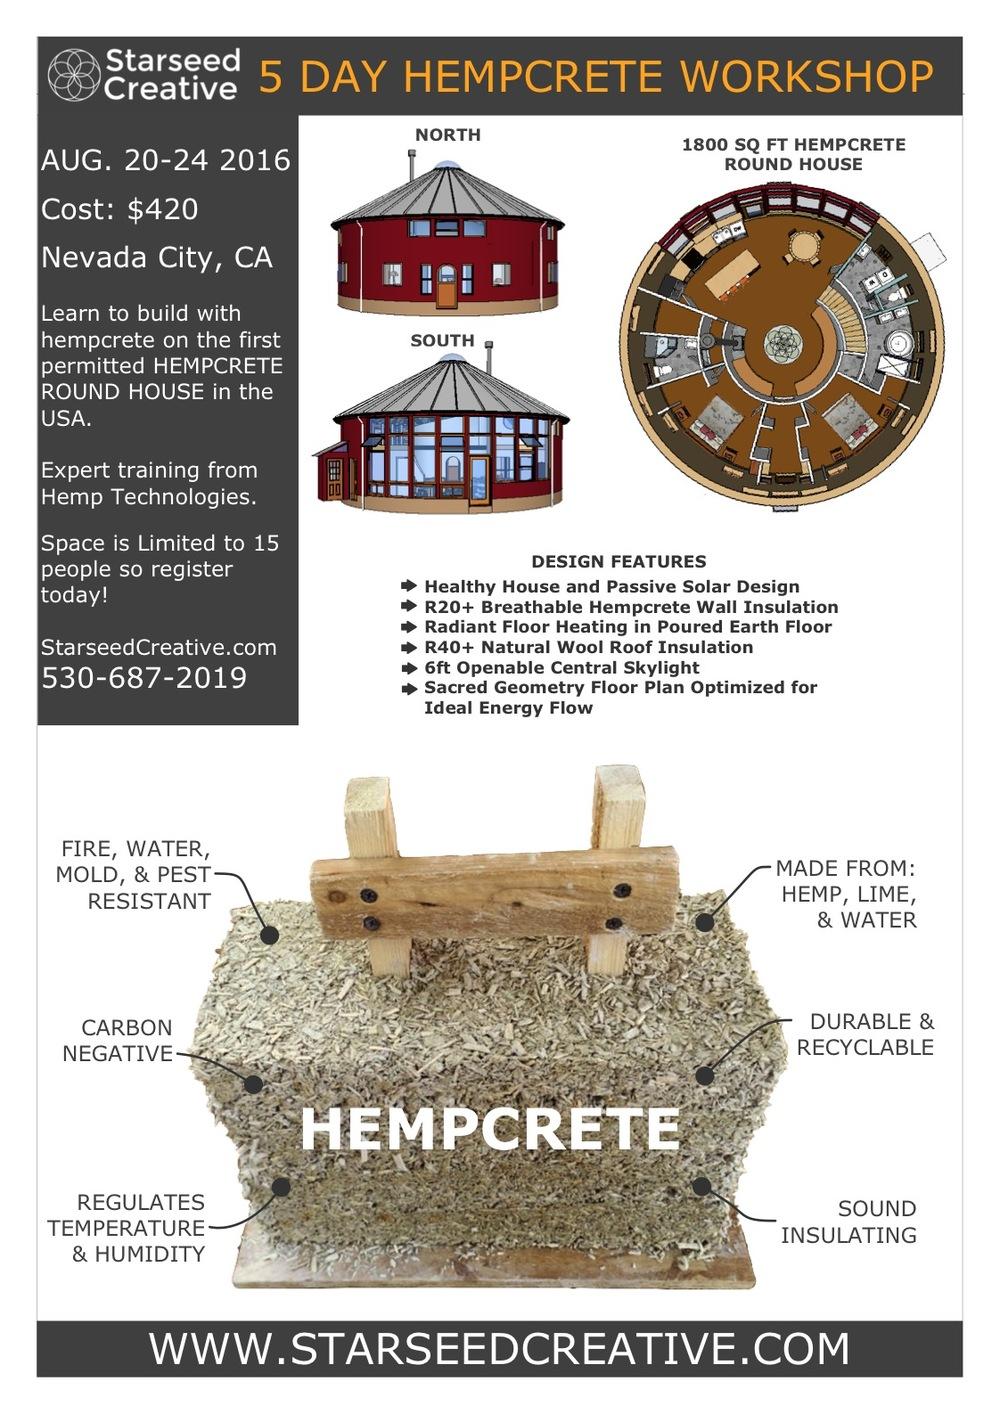 40' Hempcrete Workshop Flier.jpg